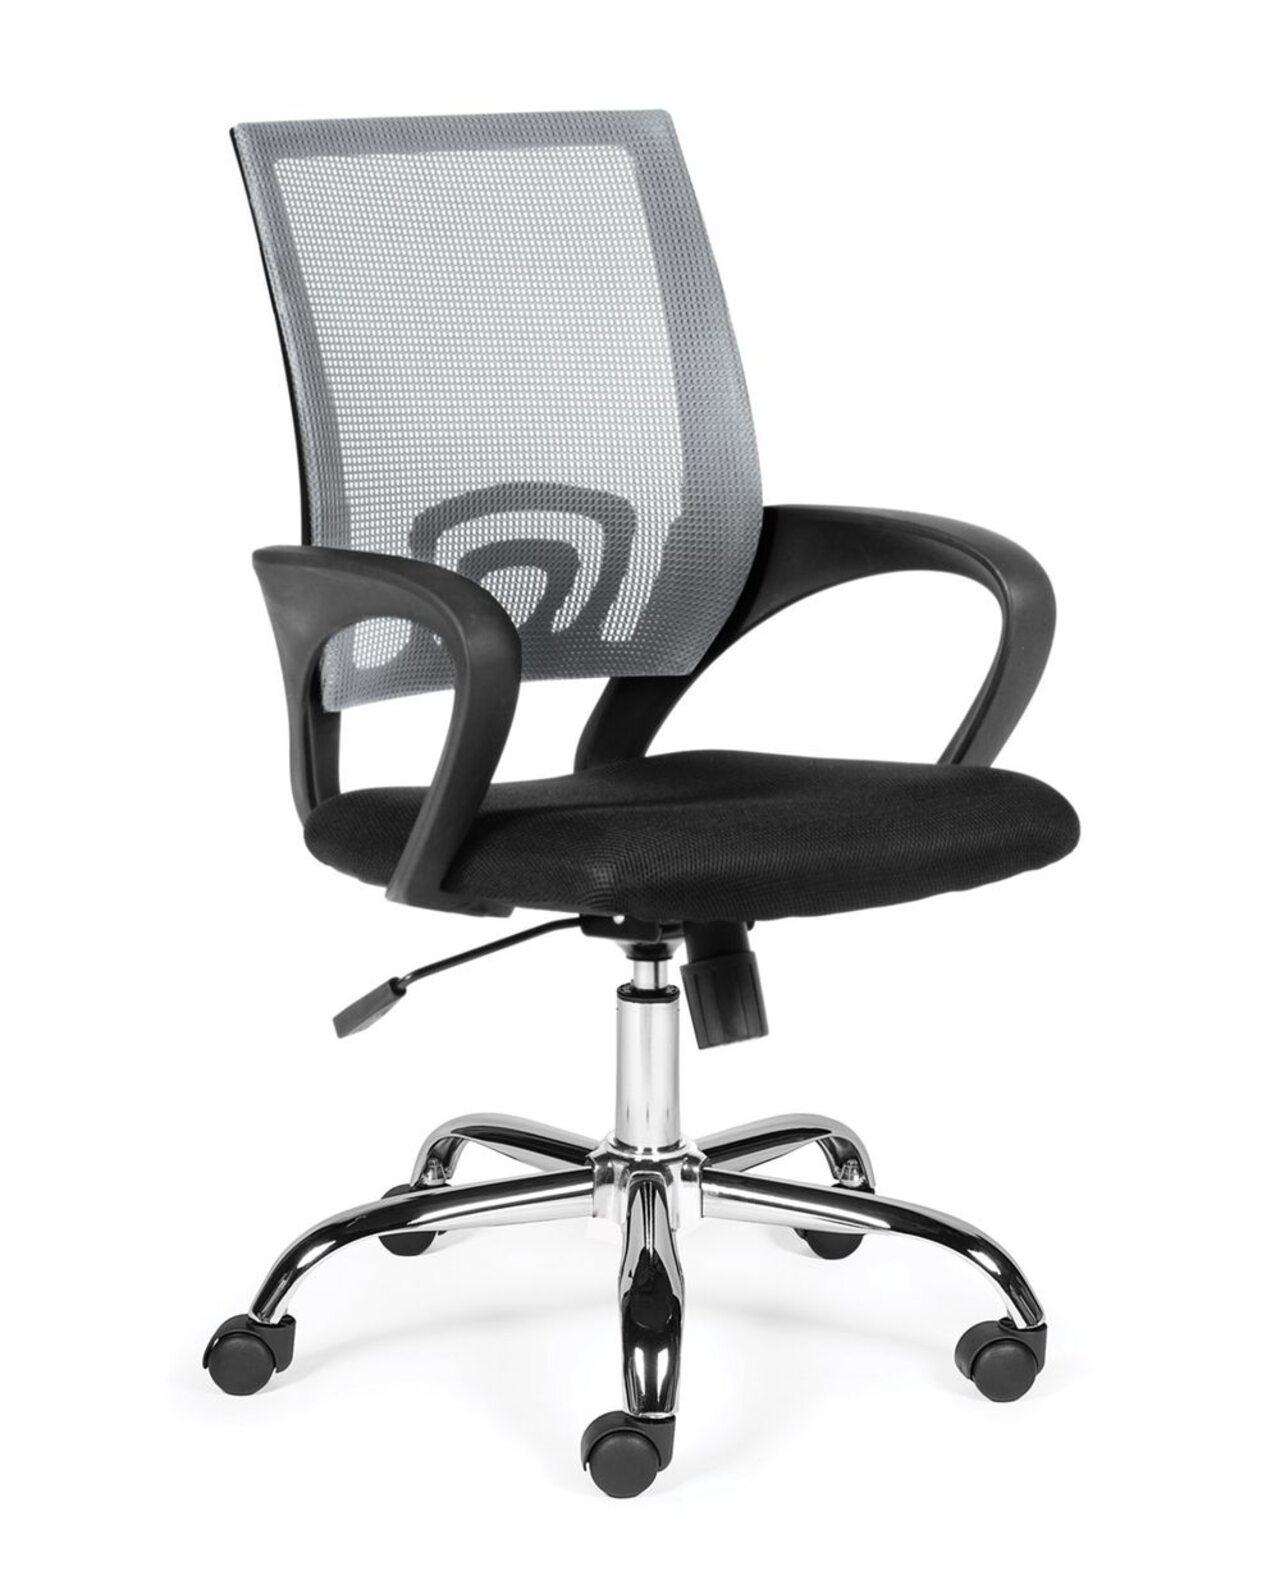 Кресло офисное Спринг 804-1 chrome  - фото 1